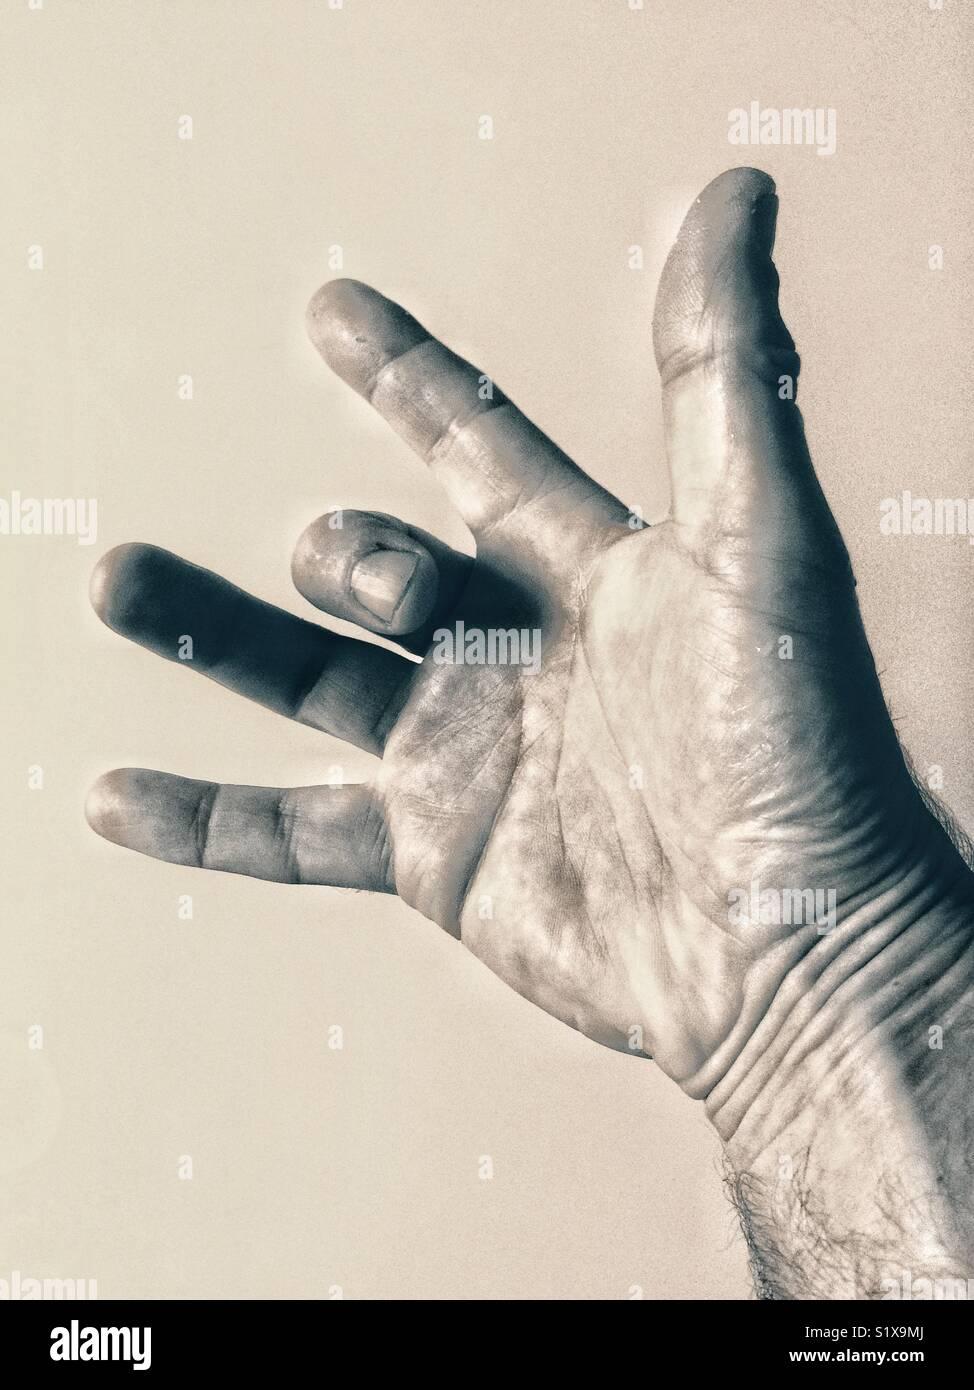 Trigger finger - Stock Image